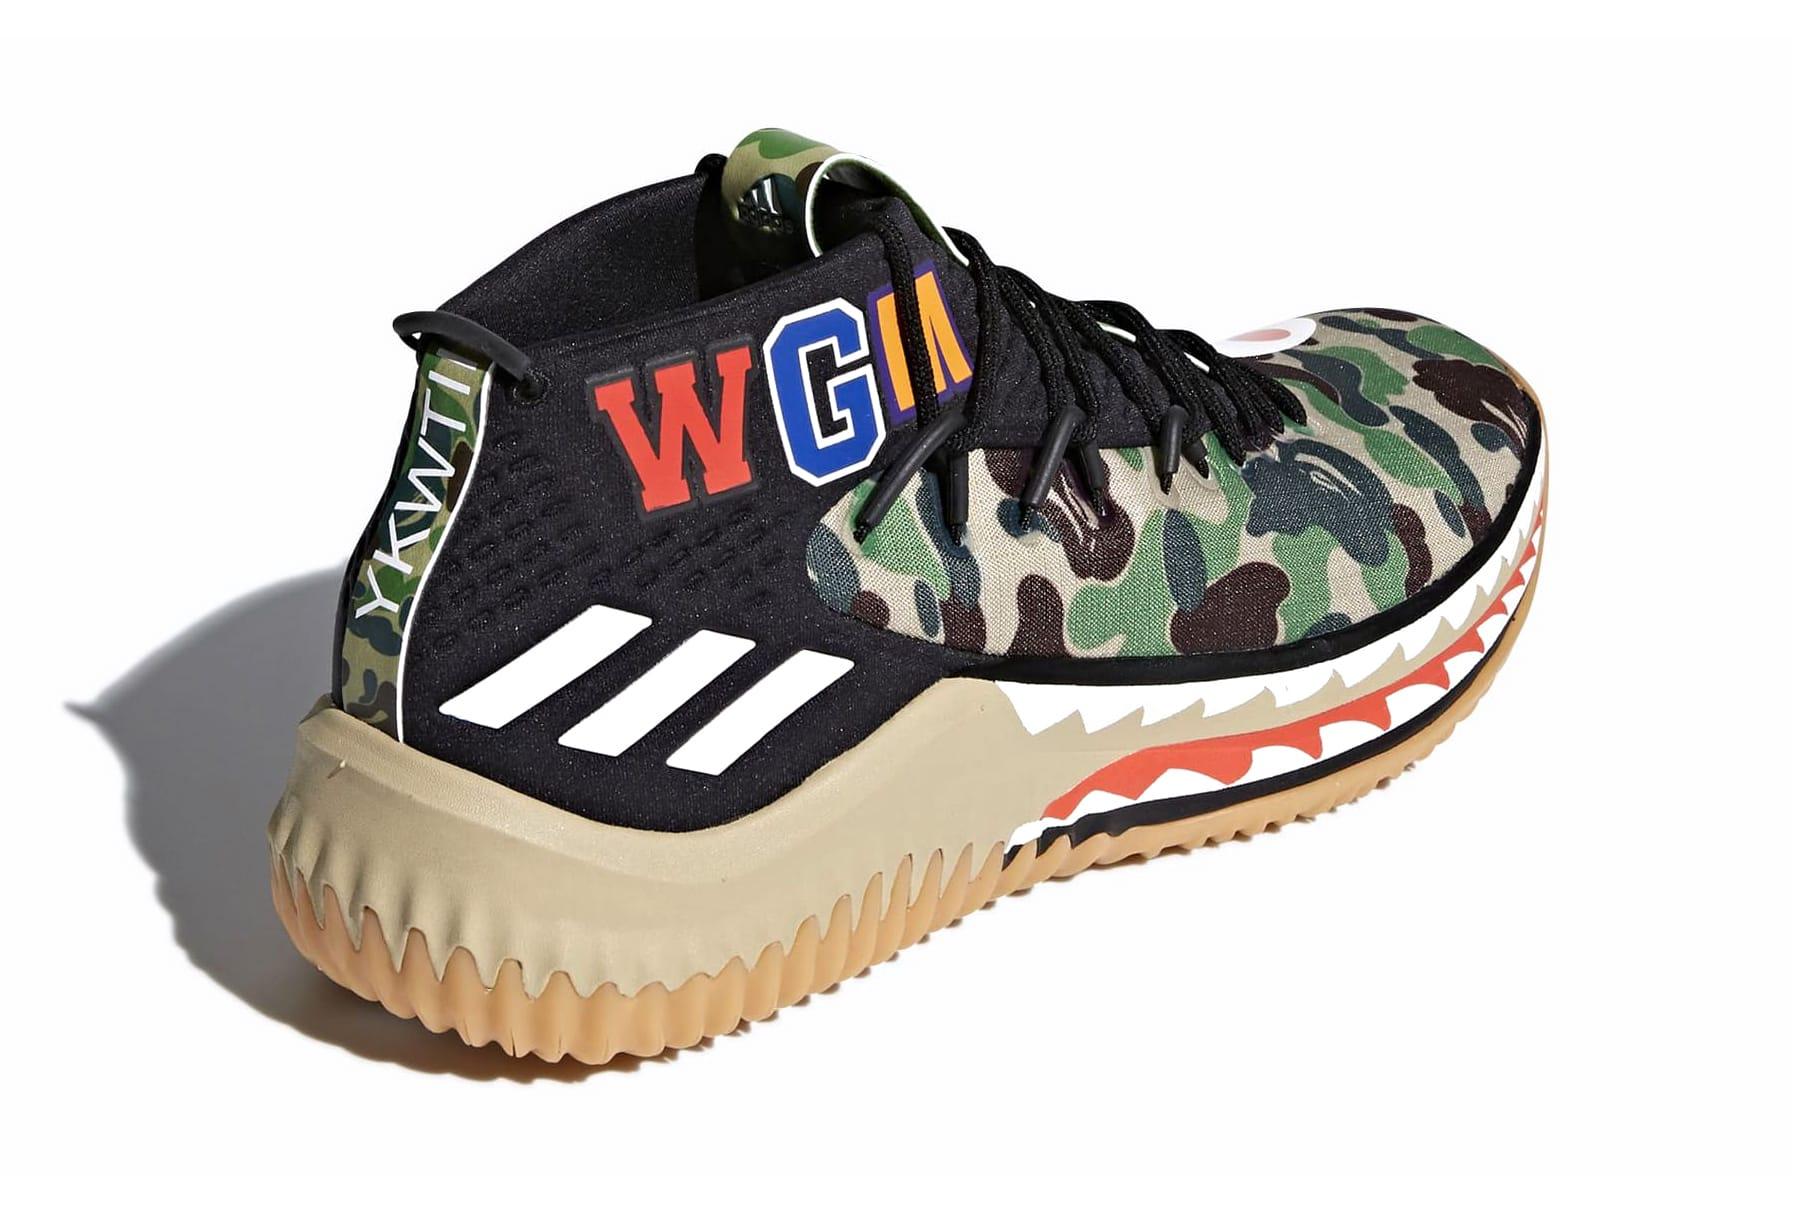 BAPE x adidas Dame 4 in Green \u0026 Black